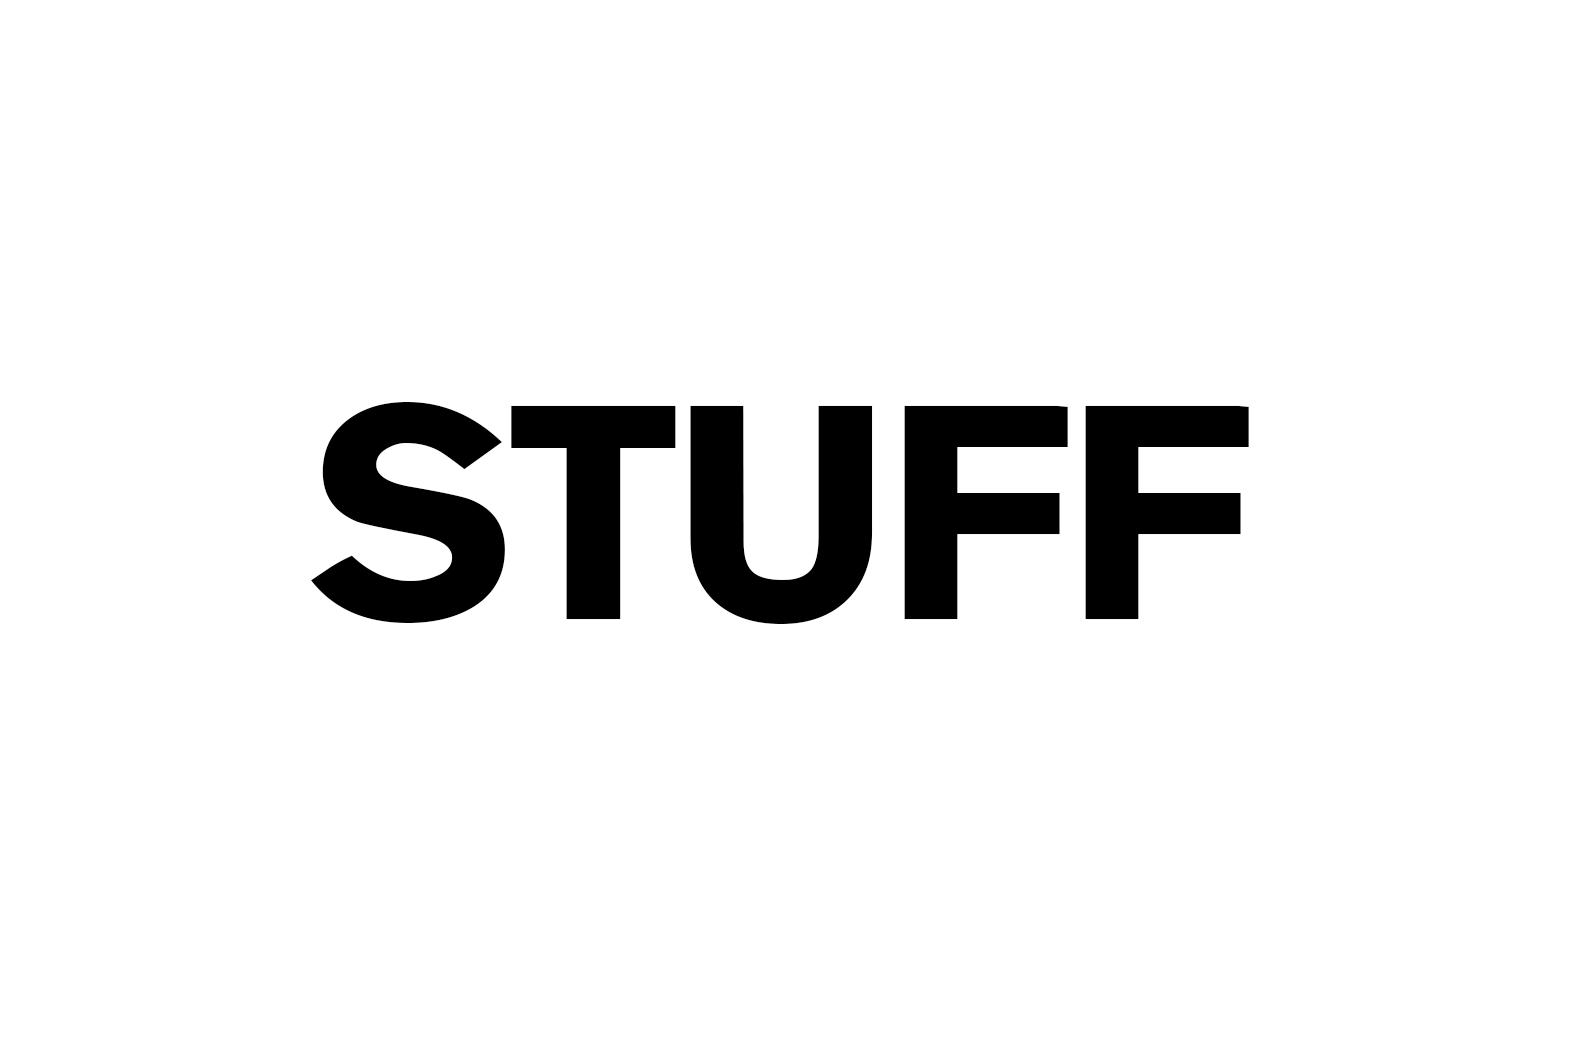 01-01 - STUFF - (2015,01,18)